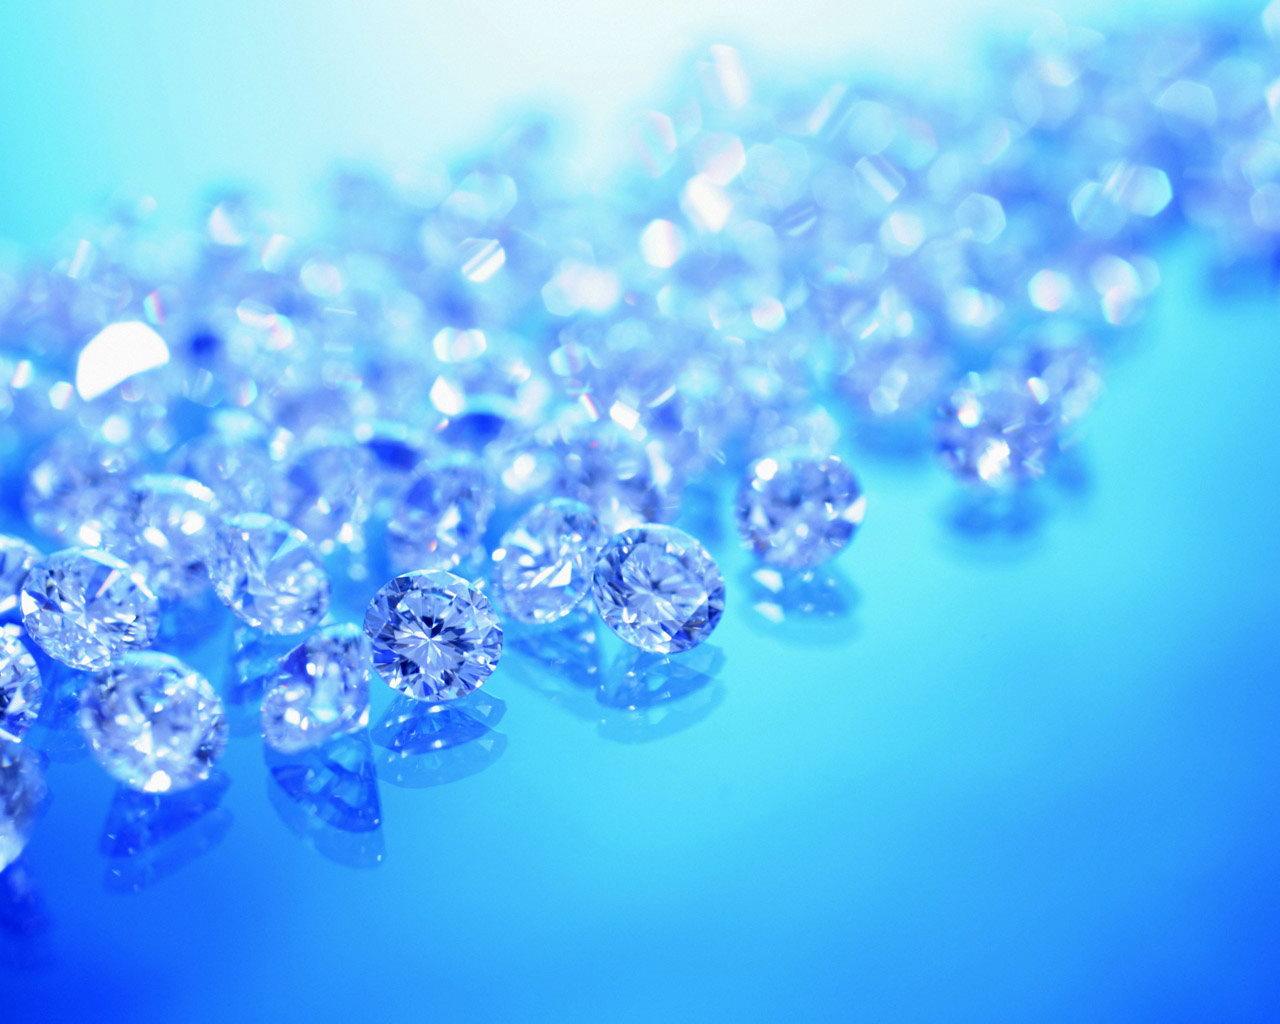 Hd Wallpapers Lightblue Blue Crystal Heart Background 1685400